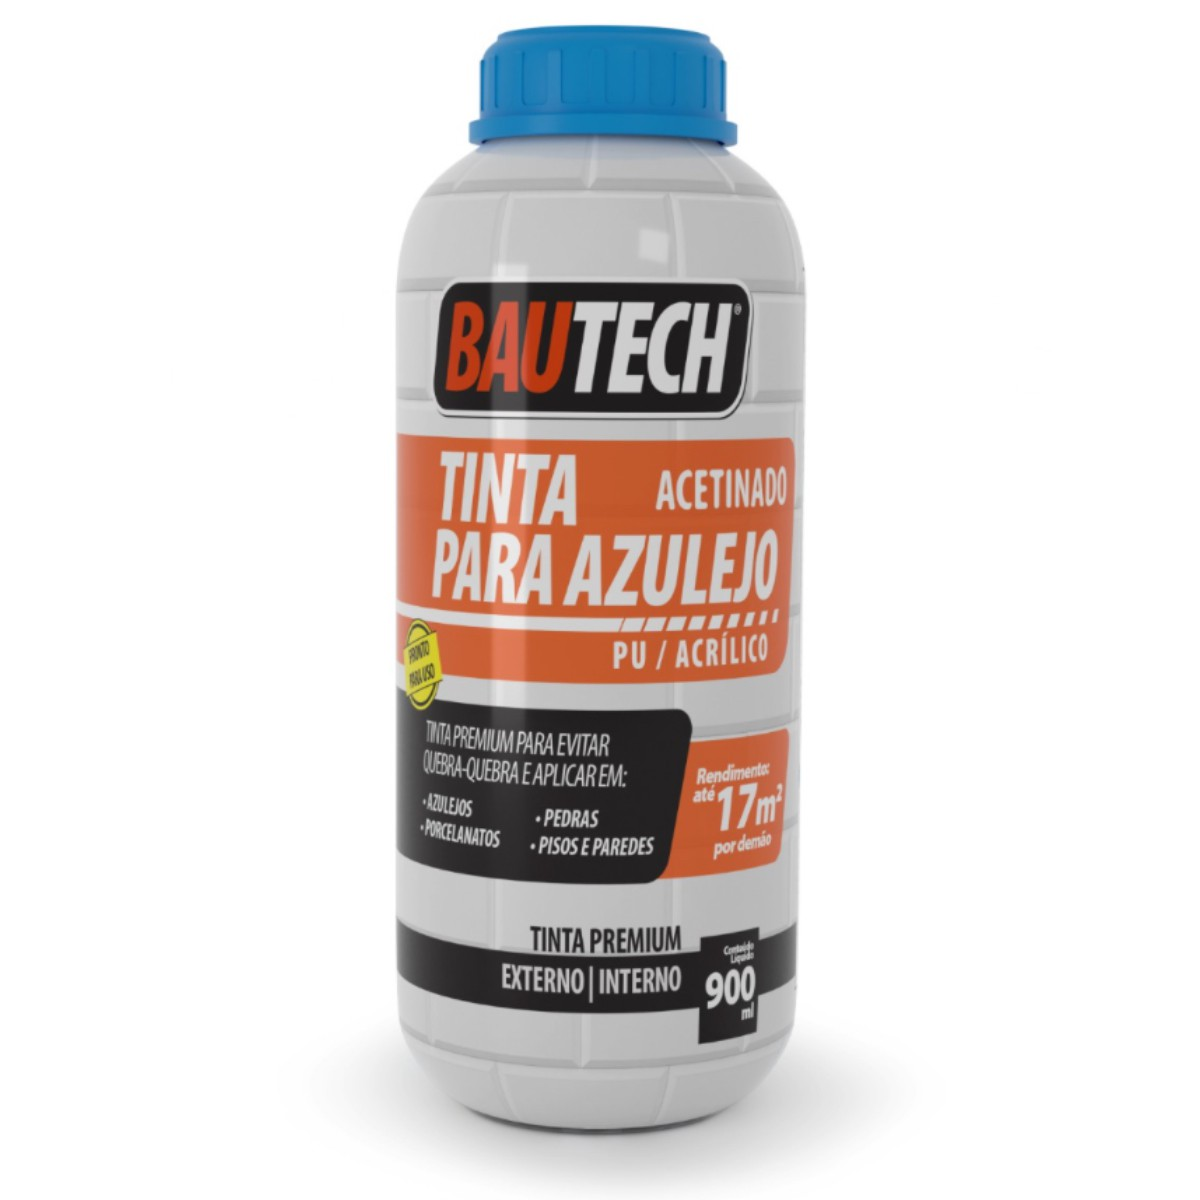 Tinta Para Azulejo Acetinado PU / Acrílico Bautech 900ml